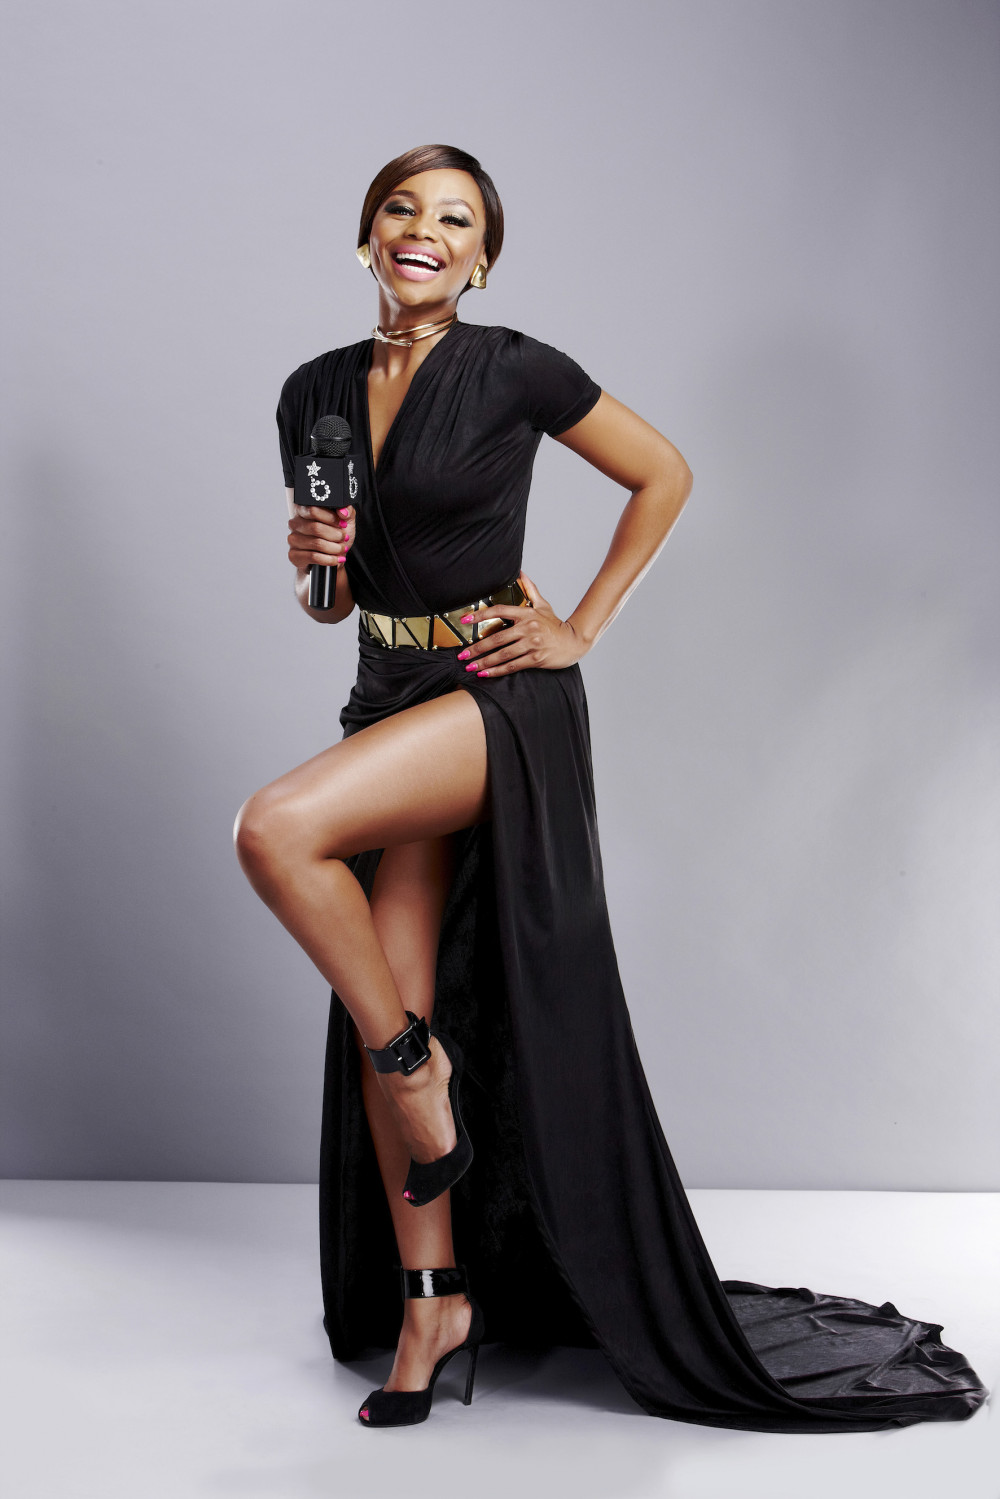 South African Media Personality Bonang Matheba To Host